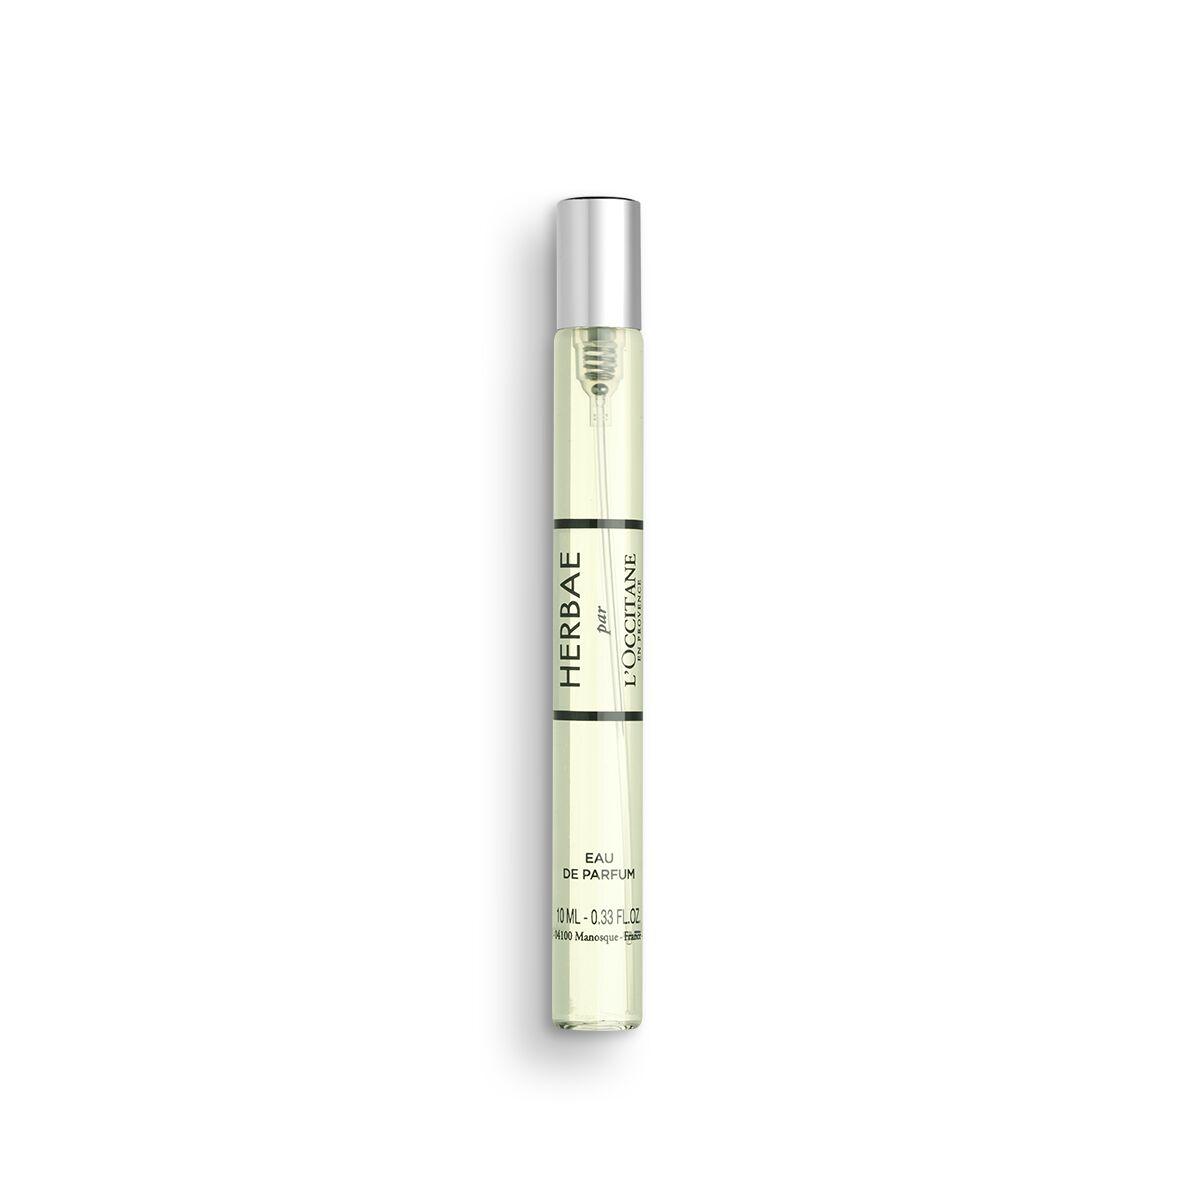 Herbae Eau de Parfum 0.33 fl. oz.